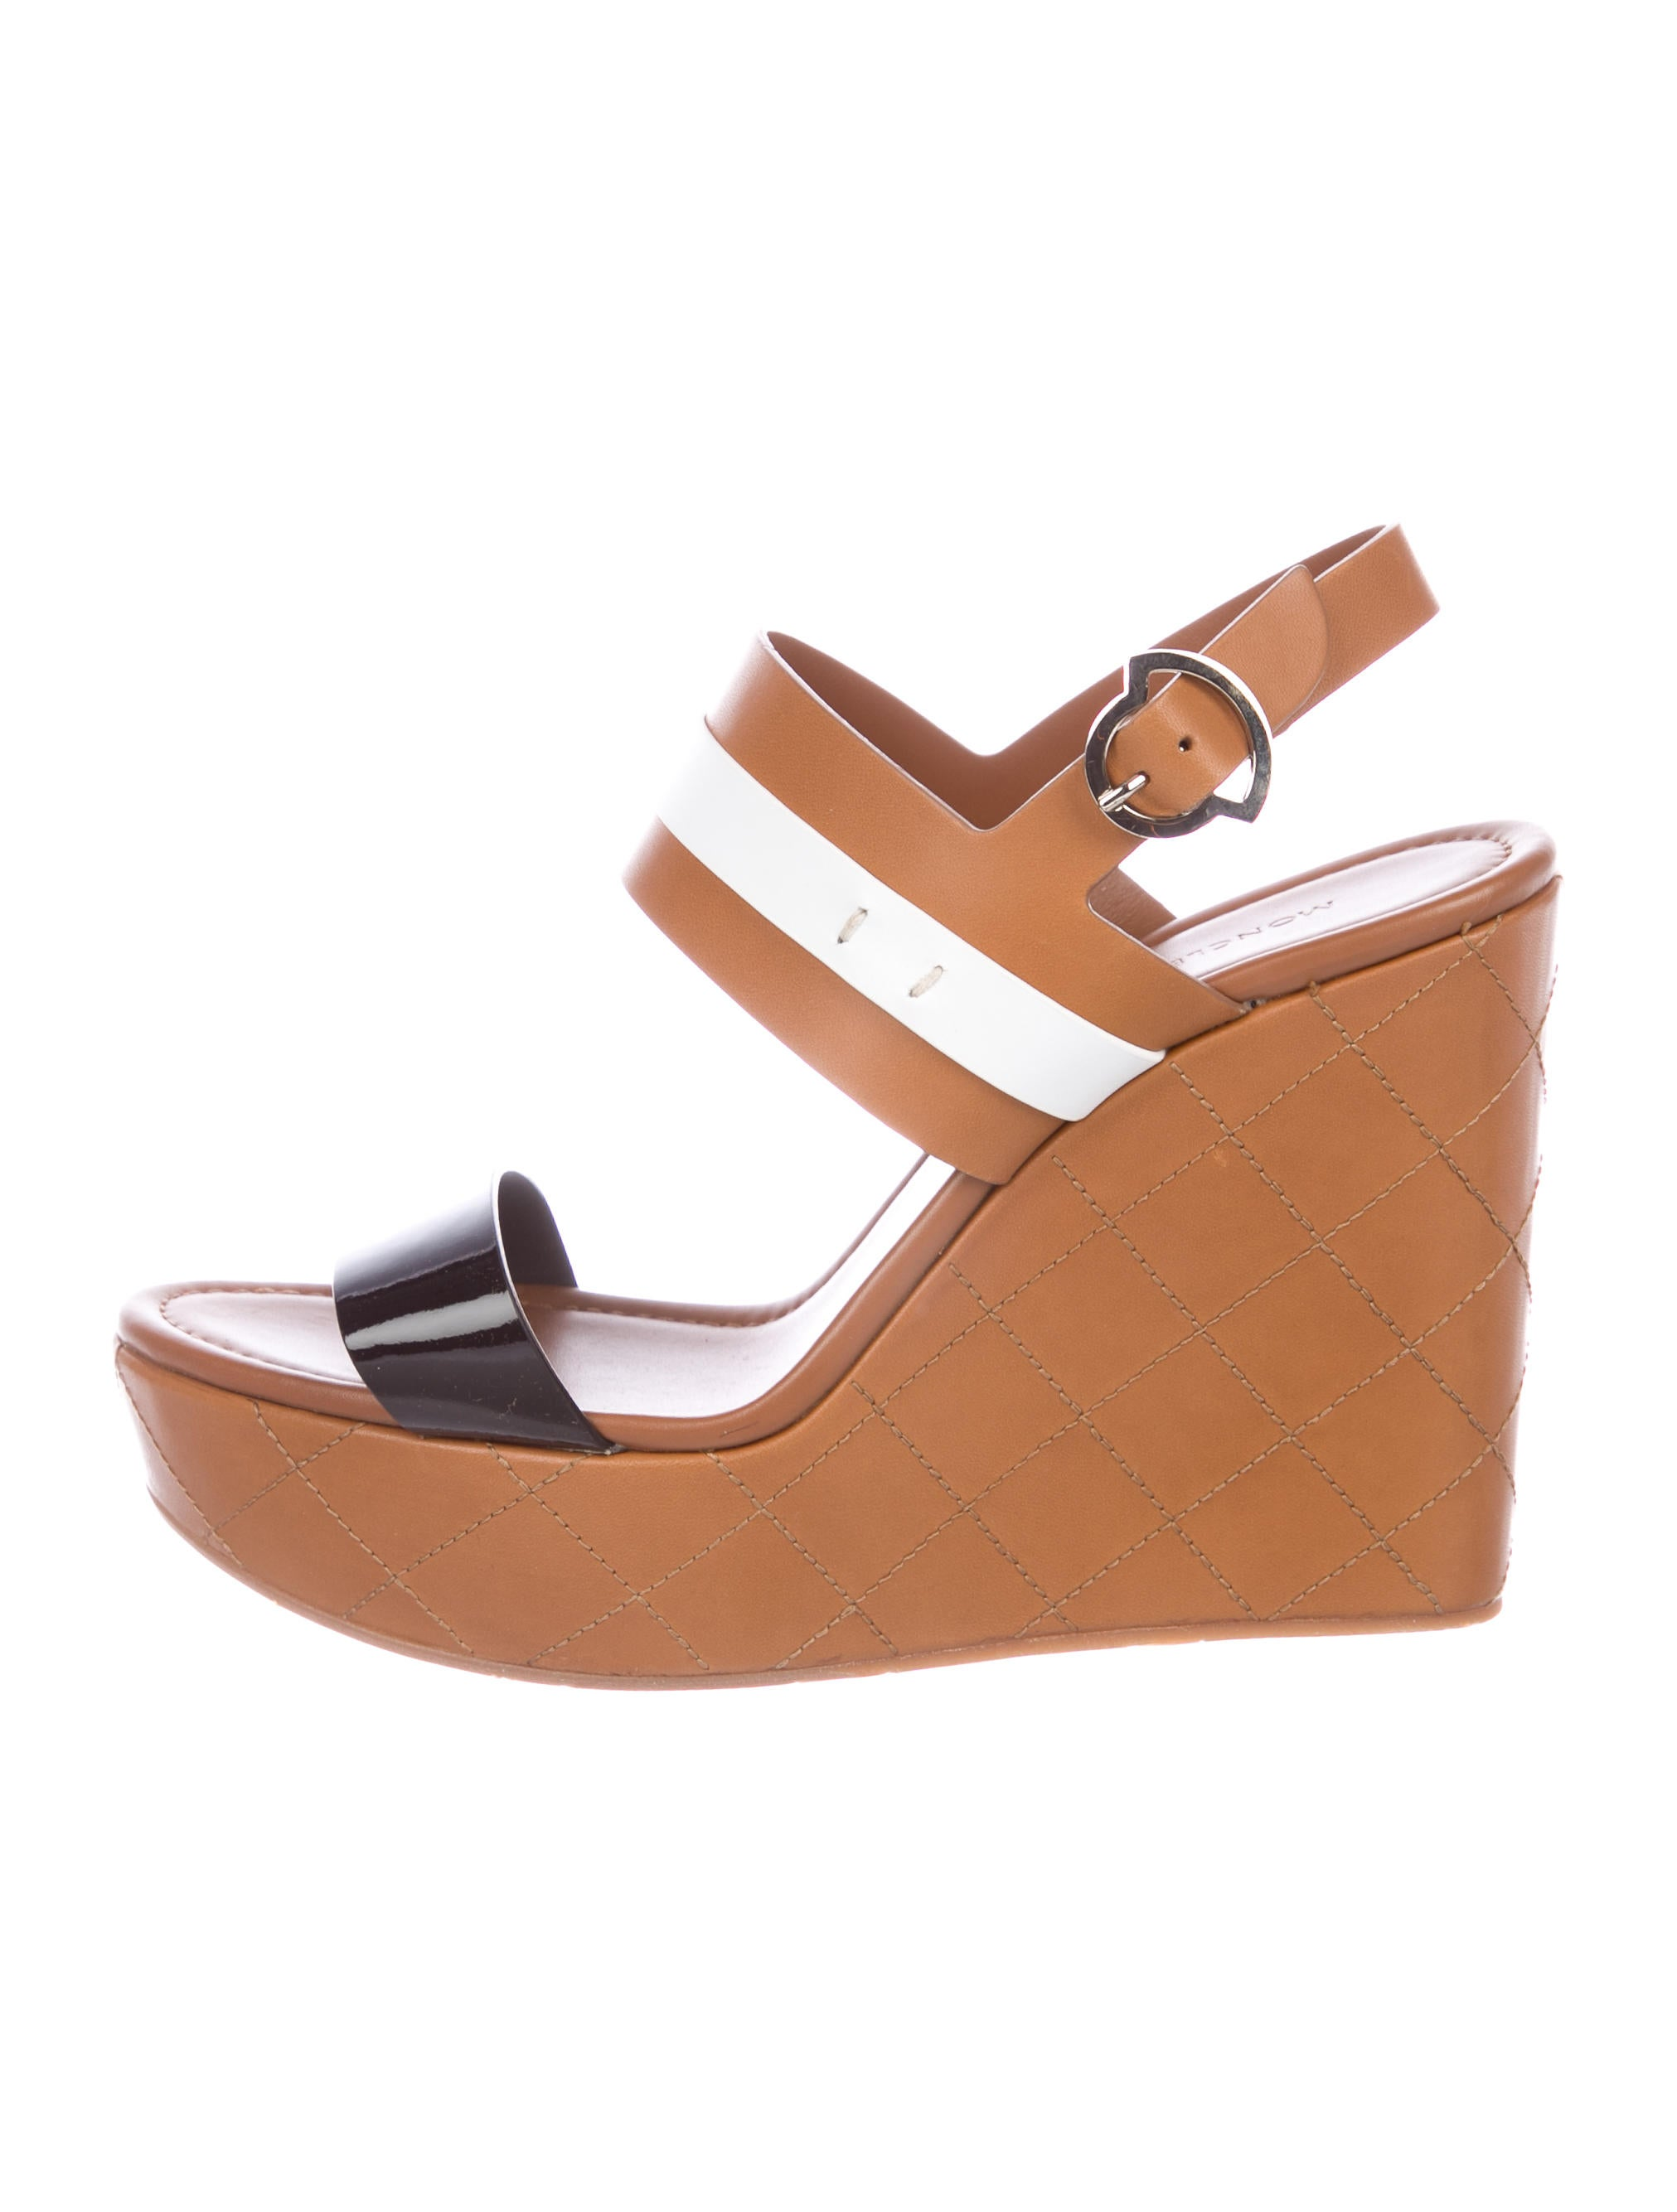 Moncler Guyana Wedge Sandals clearance store sale online mKkoS